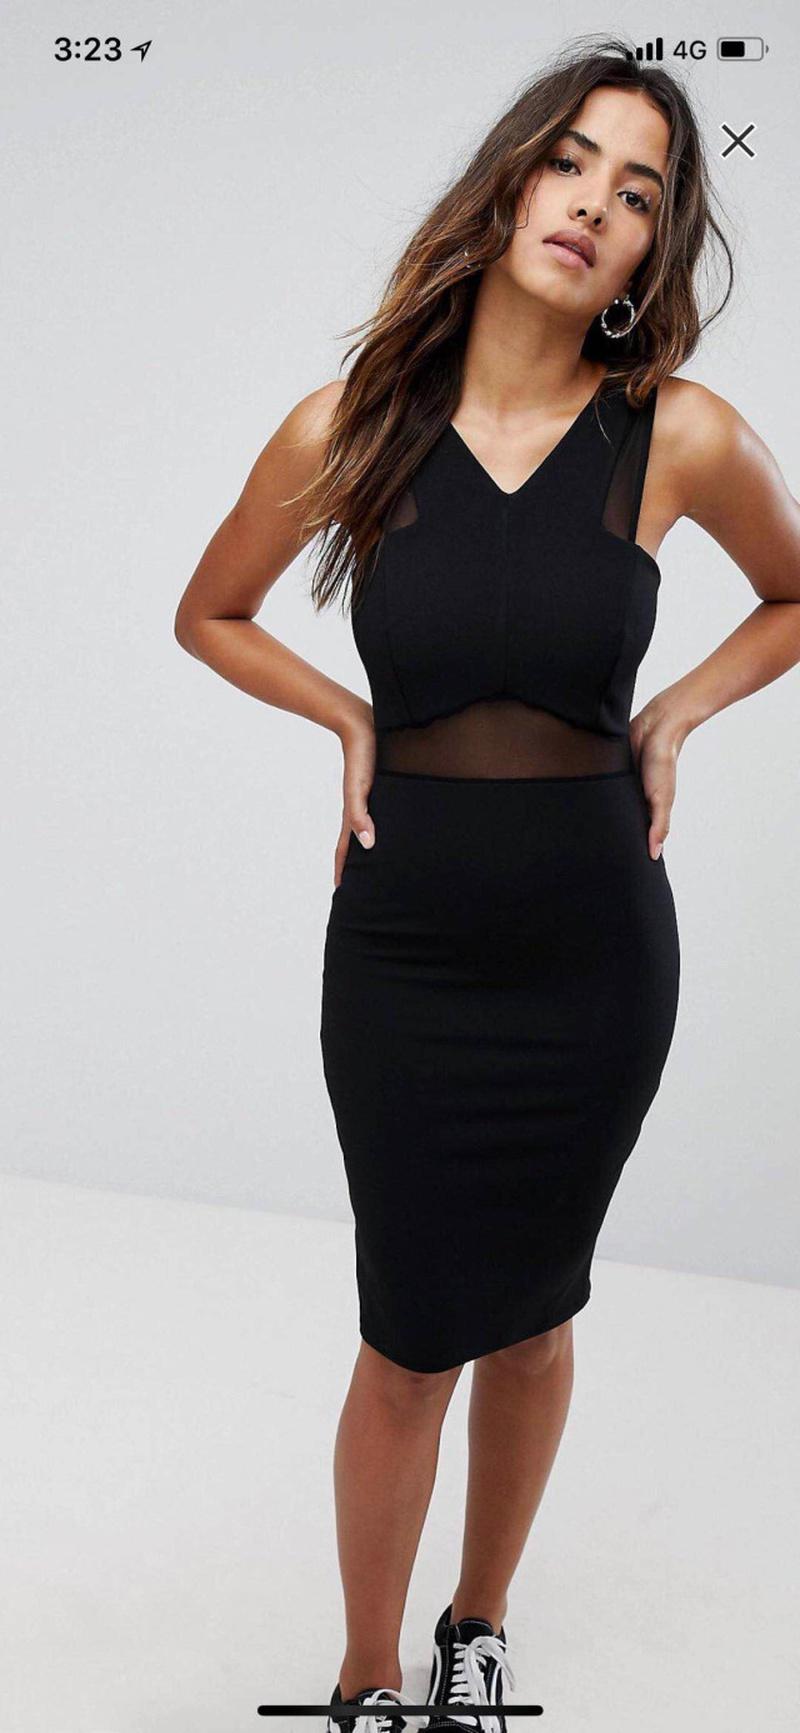 Sexy & Party Polyester  dress  (Black-S)  NHAM1477-Black-S